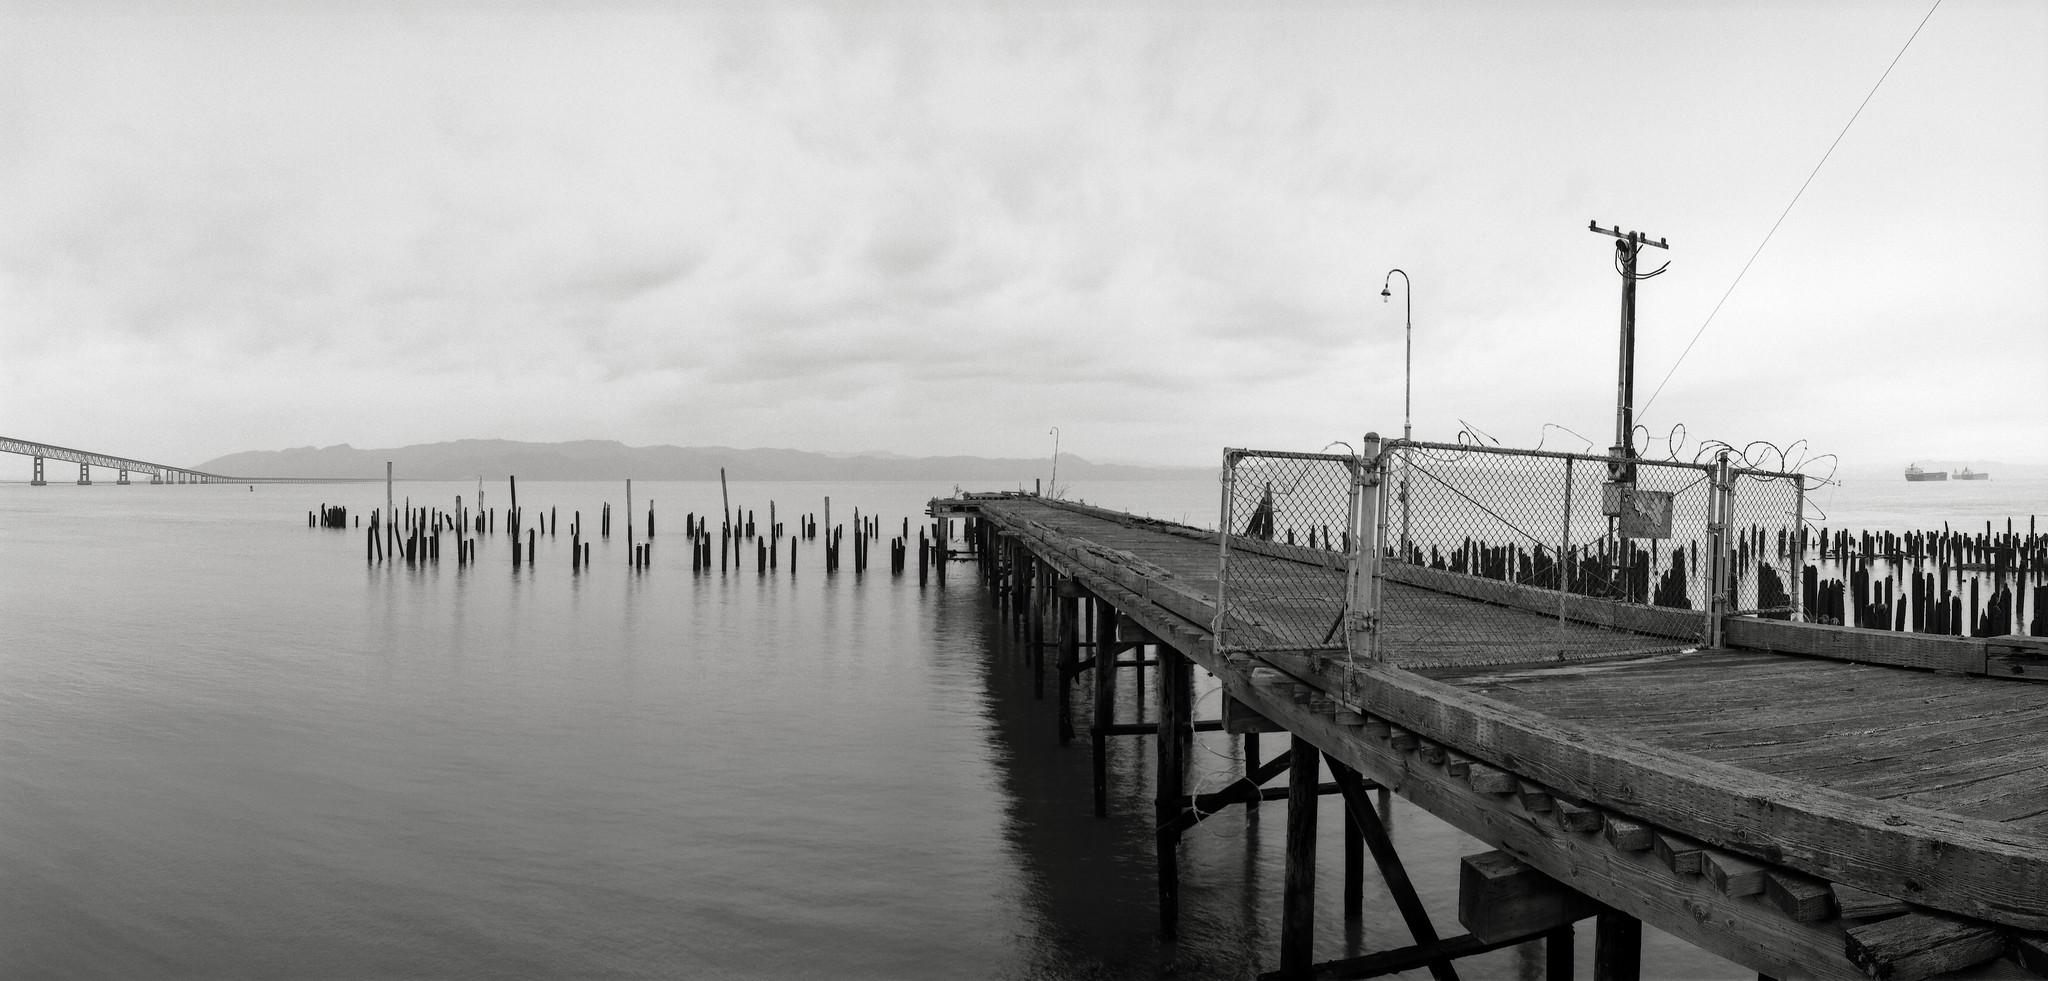 Pier, Columbia River, Astoria, Oregon | by austin granger